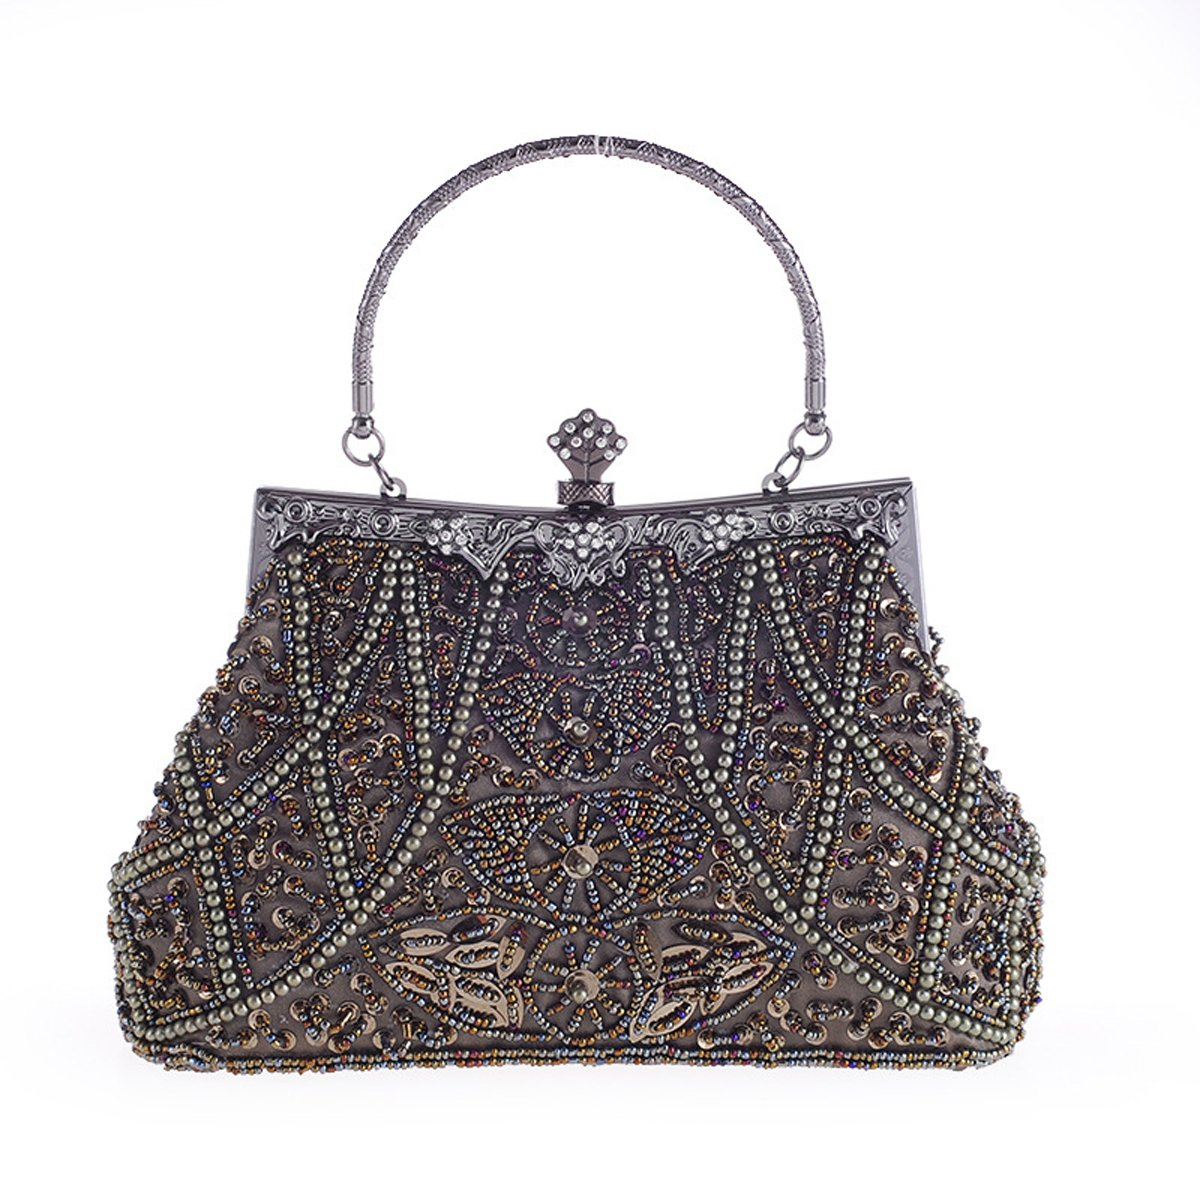 HeySun Vintage Beaded Sequin Formal Evening Bags Antique Style Wedding Handbag Purse for Women (Bronze)